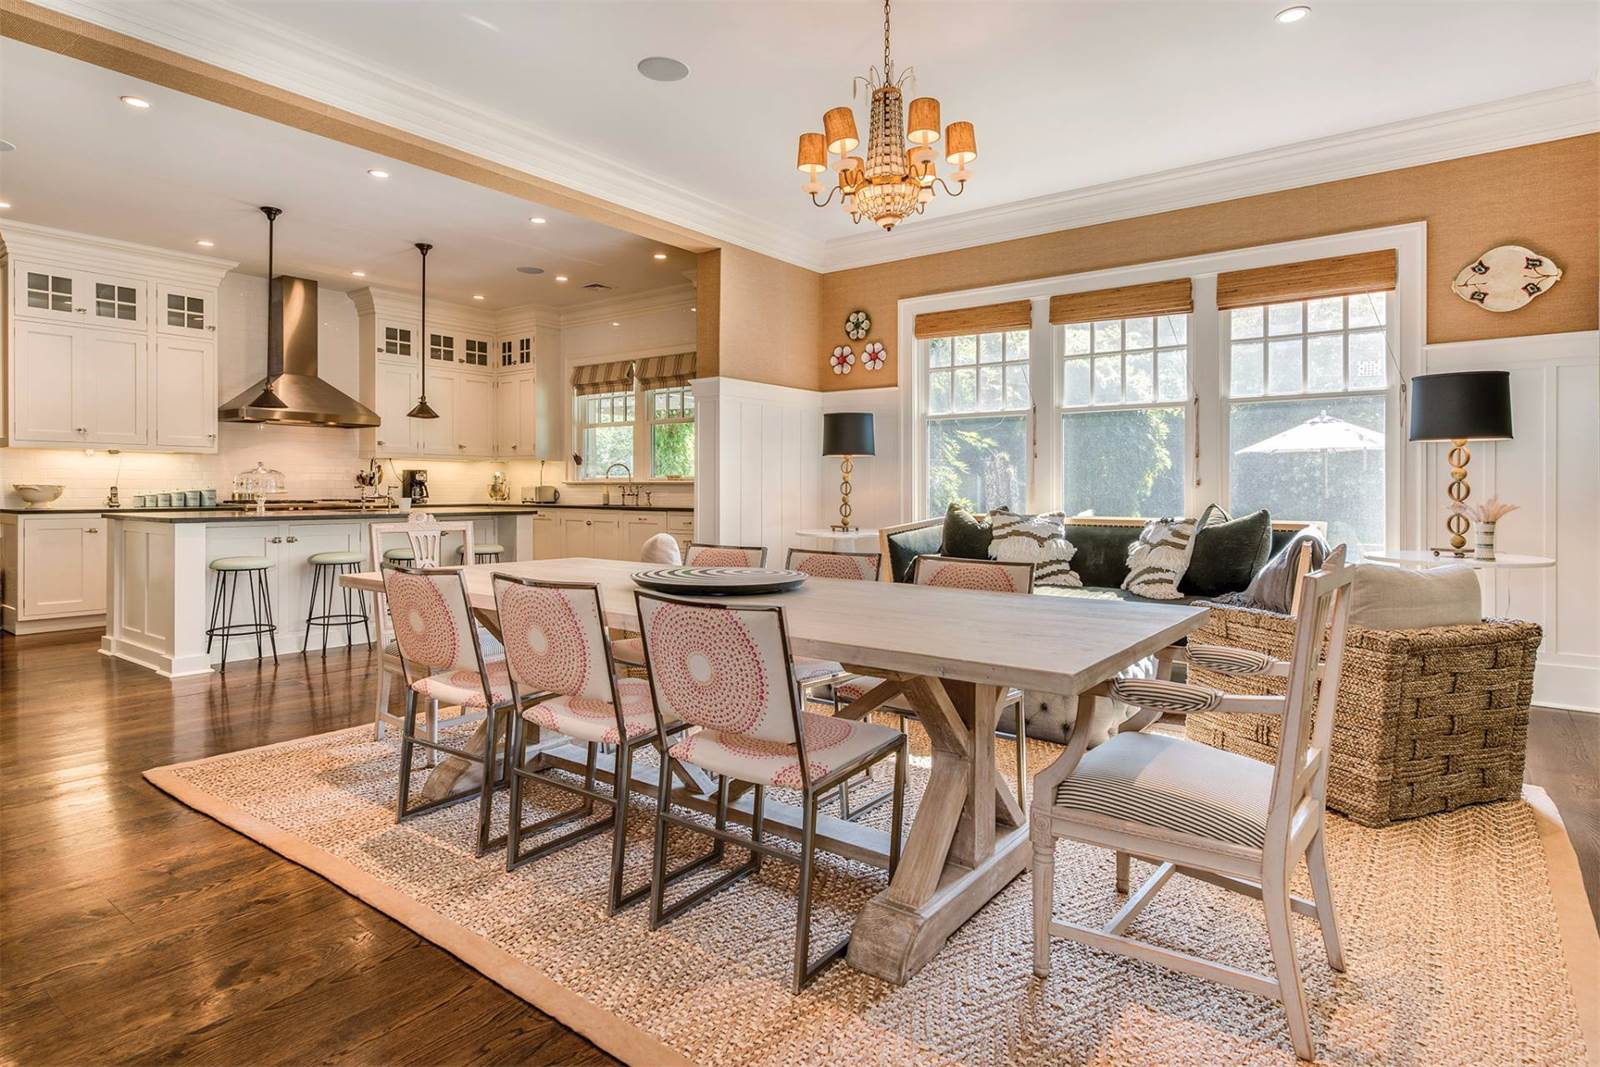 Food Network darling Katie Lee selling decked-out Hamptons estate ...